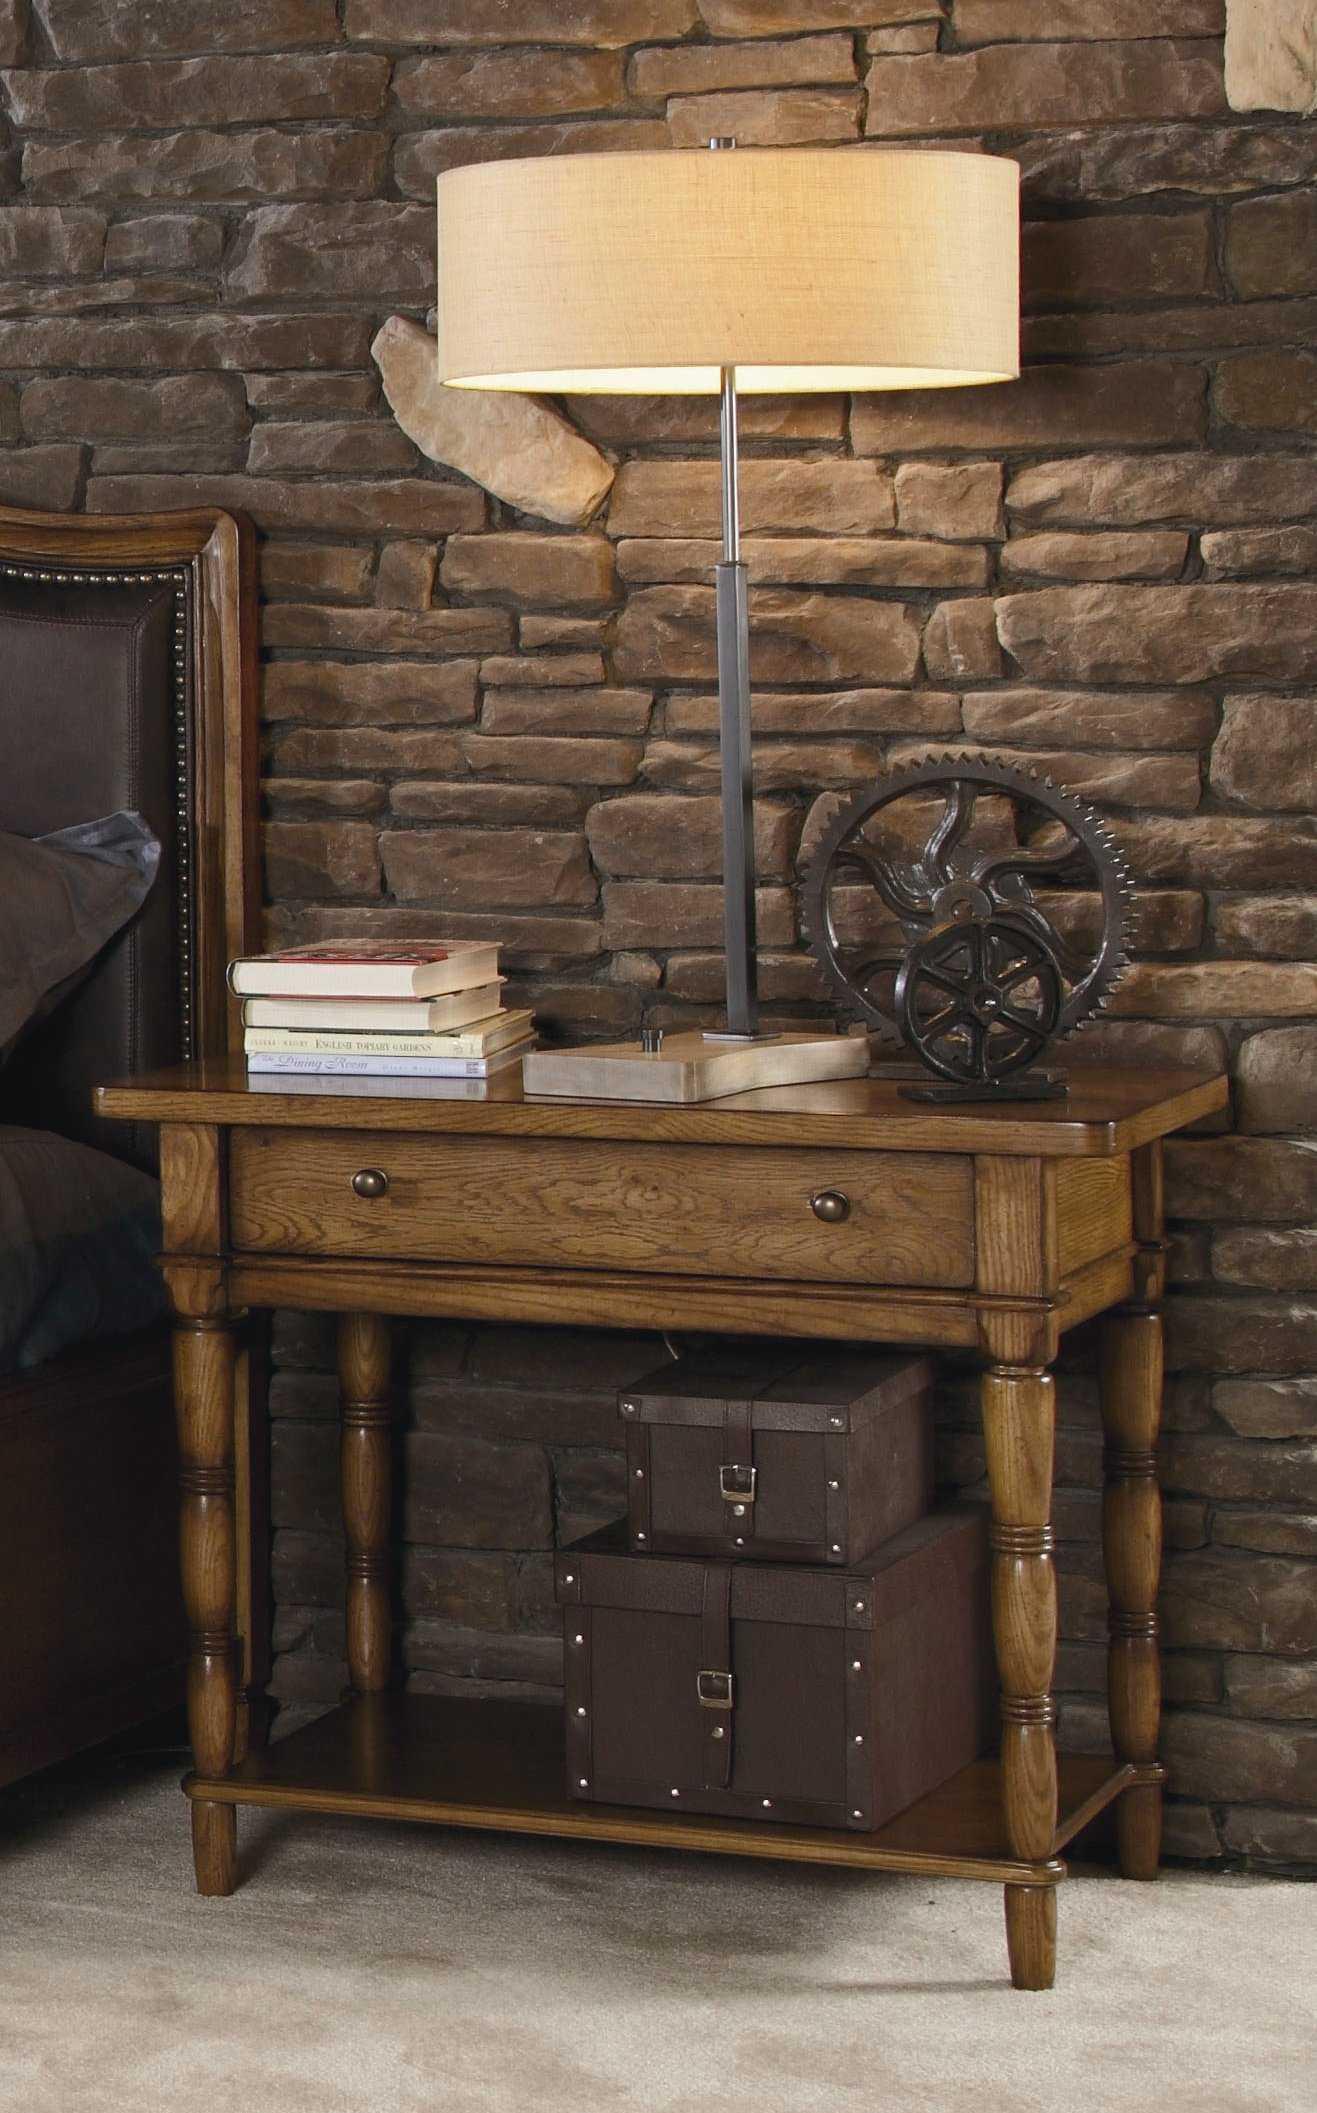 American drew americana home 3 piece bedroom set ad114326r400 for American drew oak bedroom furniture